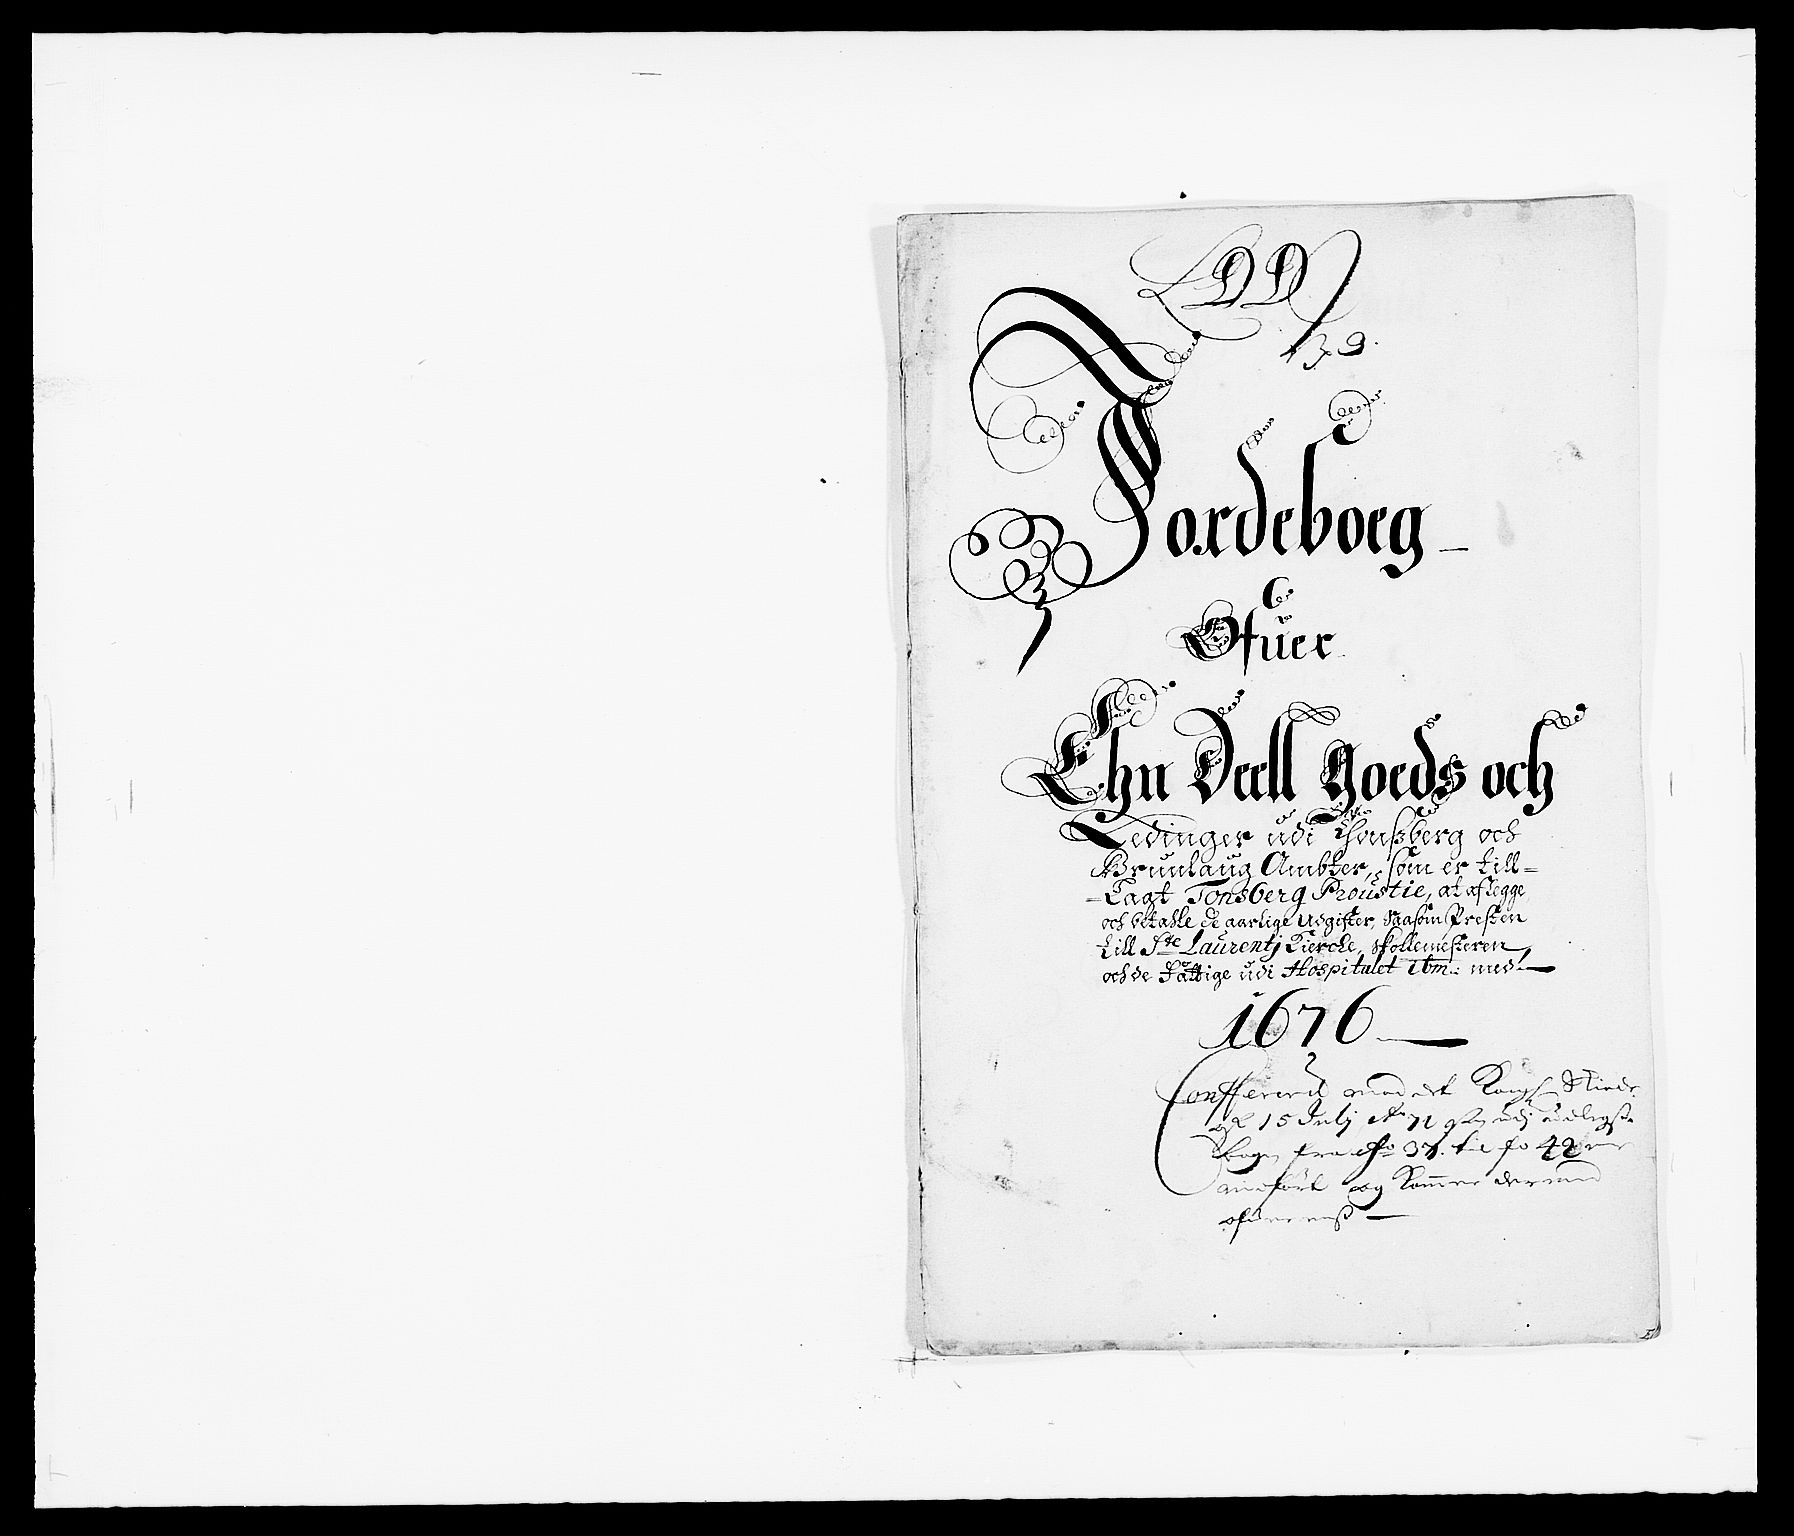 RA, Rentekammeret inntil 1814, Reviderte regnskaper, Fogderegnskap, R32/L1845: Fogderegnskap Jarlsberg grevskap, 1676-1678, s. 128